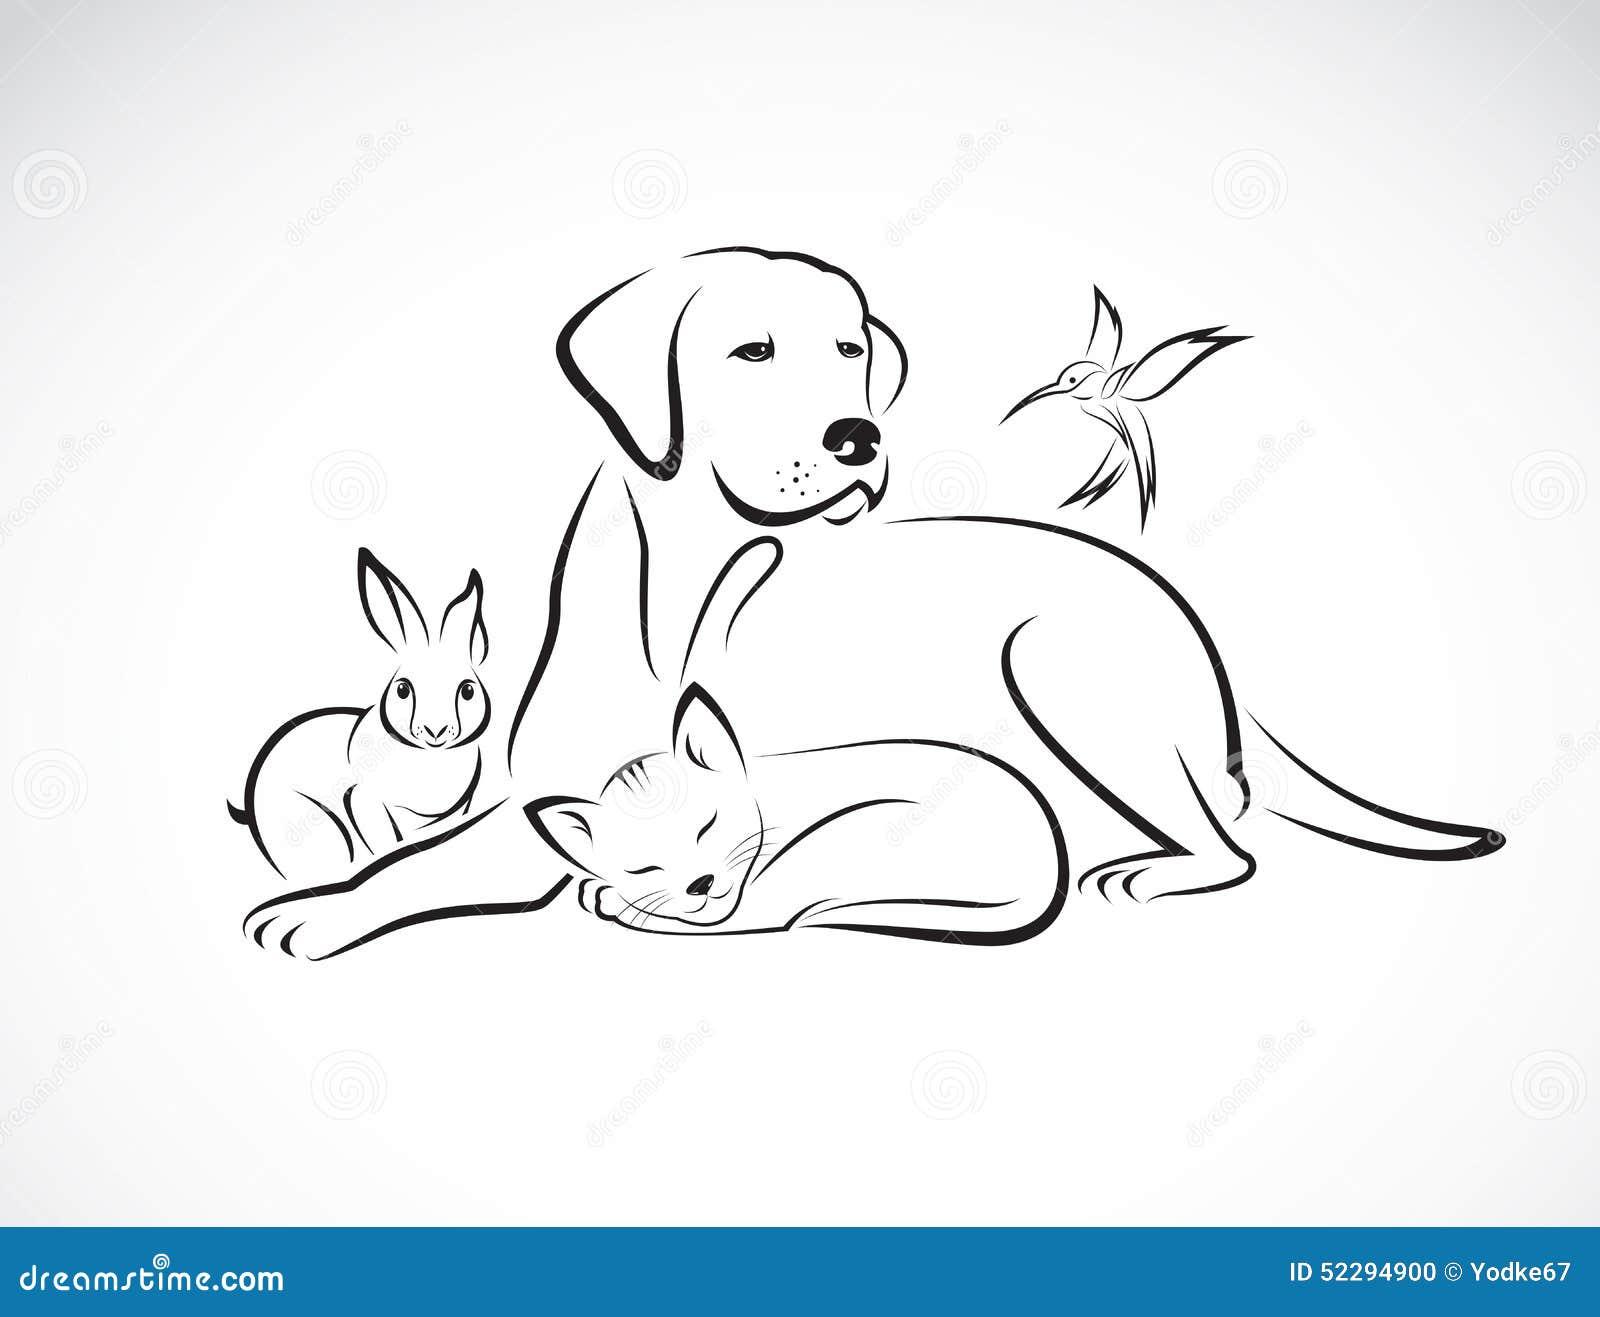 Vector Group Of Pets - Dog, Cat, Bird, Rabbit, Stock